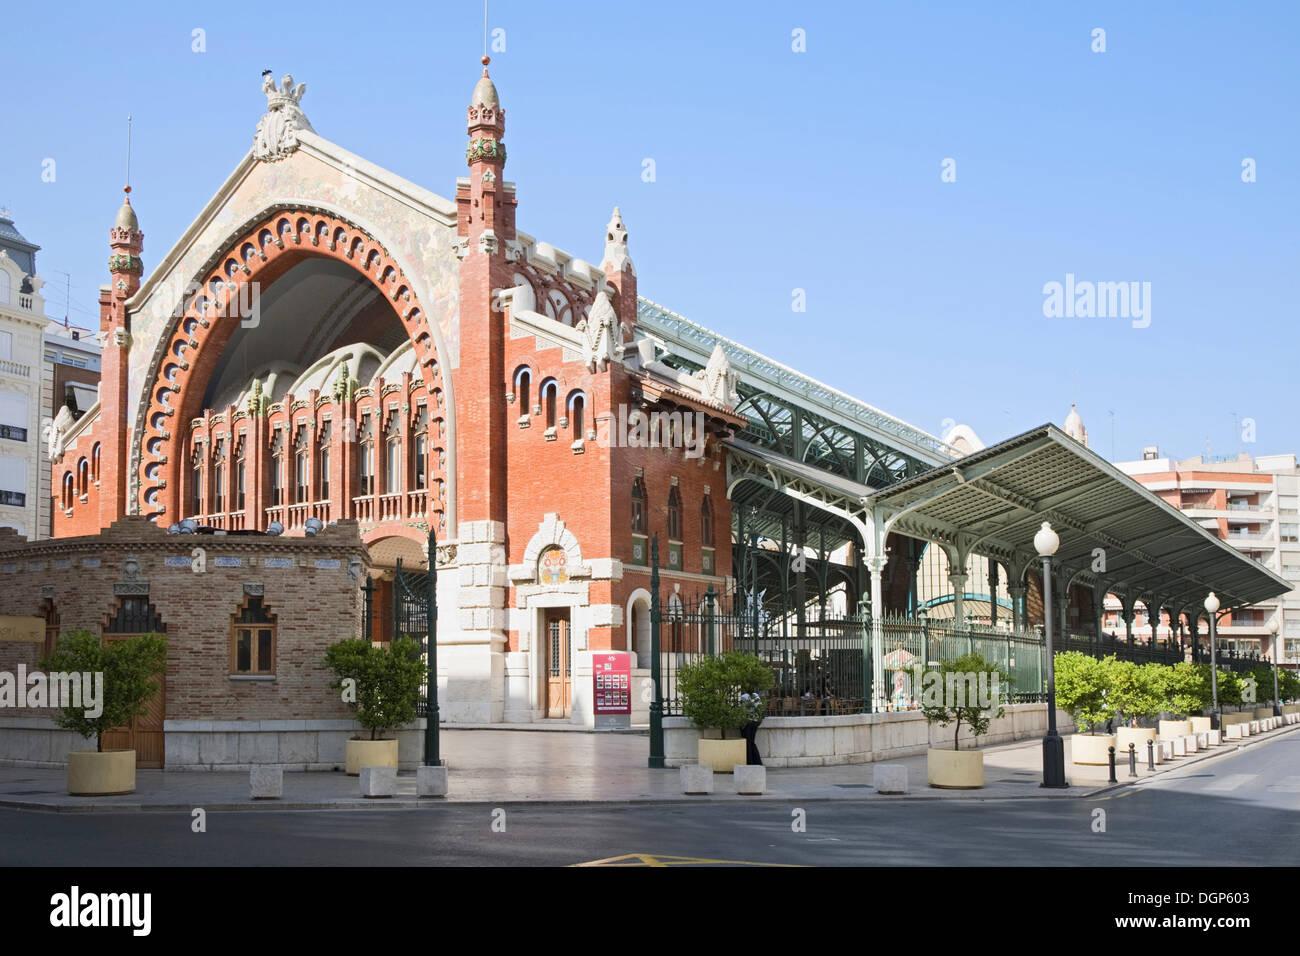 Mercado de Colon, Valencia, Comunidad Valenciana, Spain, Europe - Stock Image